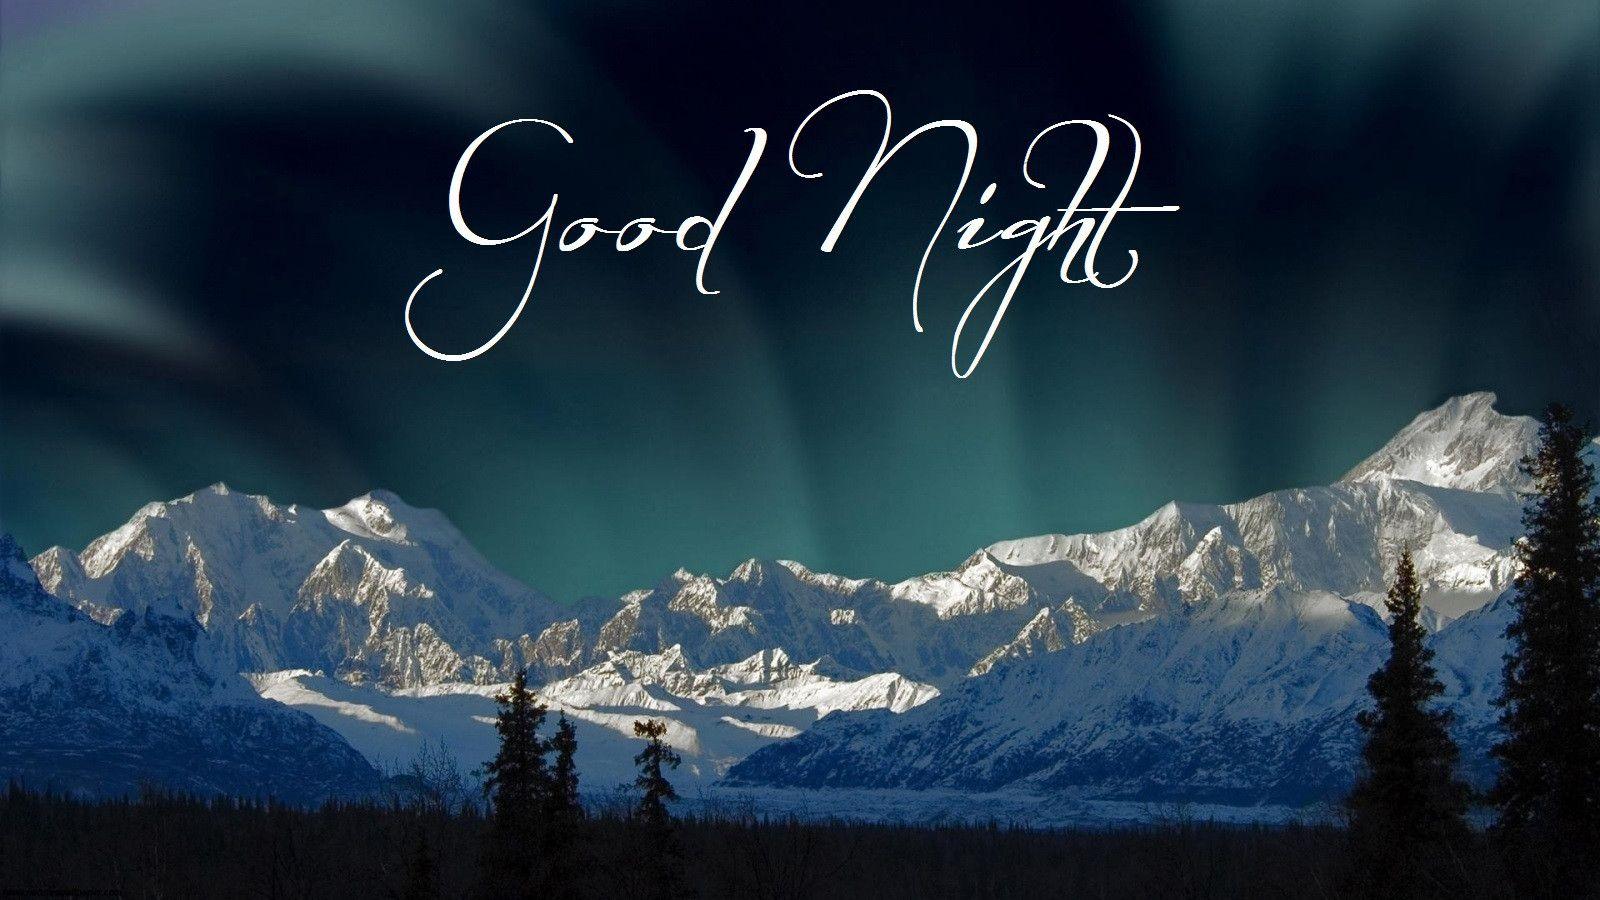 Mountains Good Night Wallpaper Good Night Wallpaper Beautiful Good Night Images Lovely Good Night